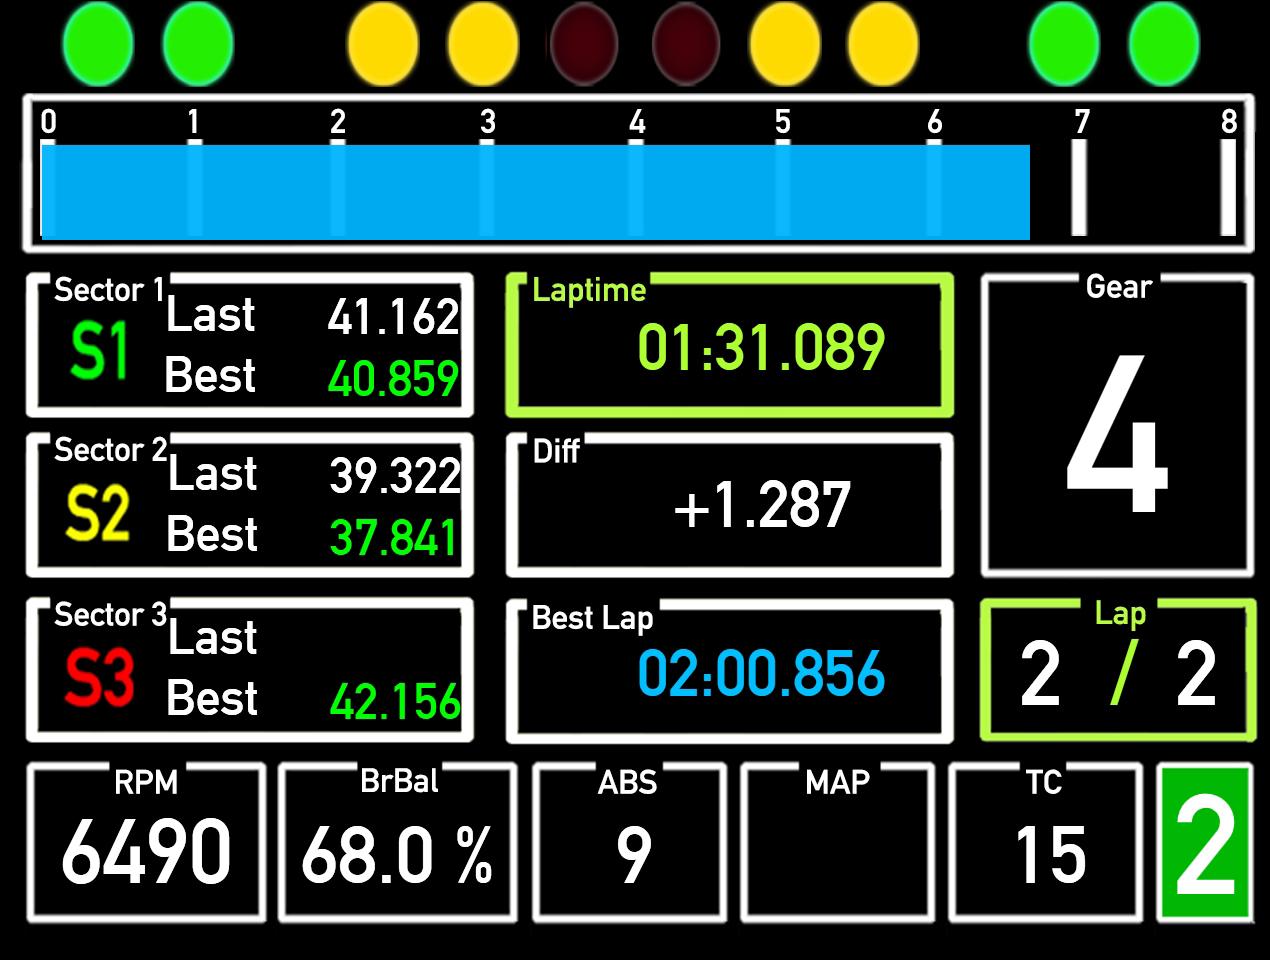 F1Simgames Mercedes AMG GT3 Dashboard v1 0 for SimHUB - F1Simgames